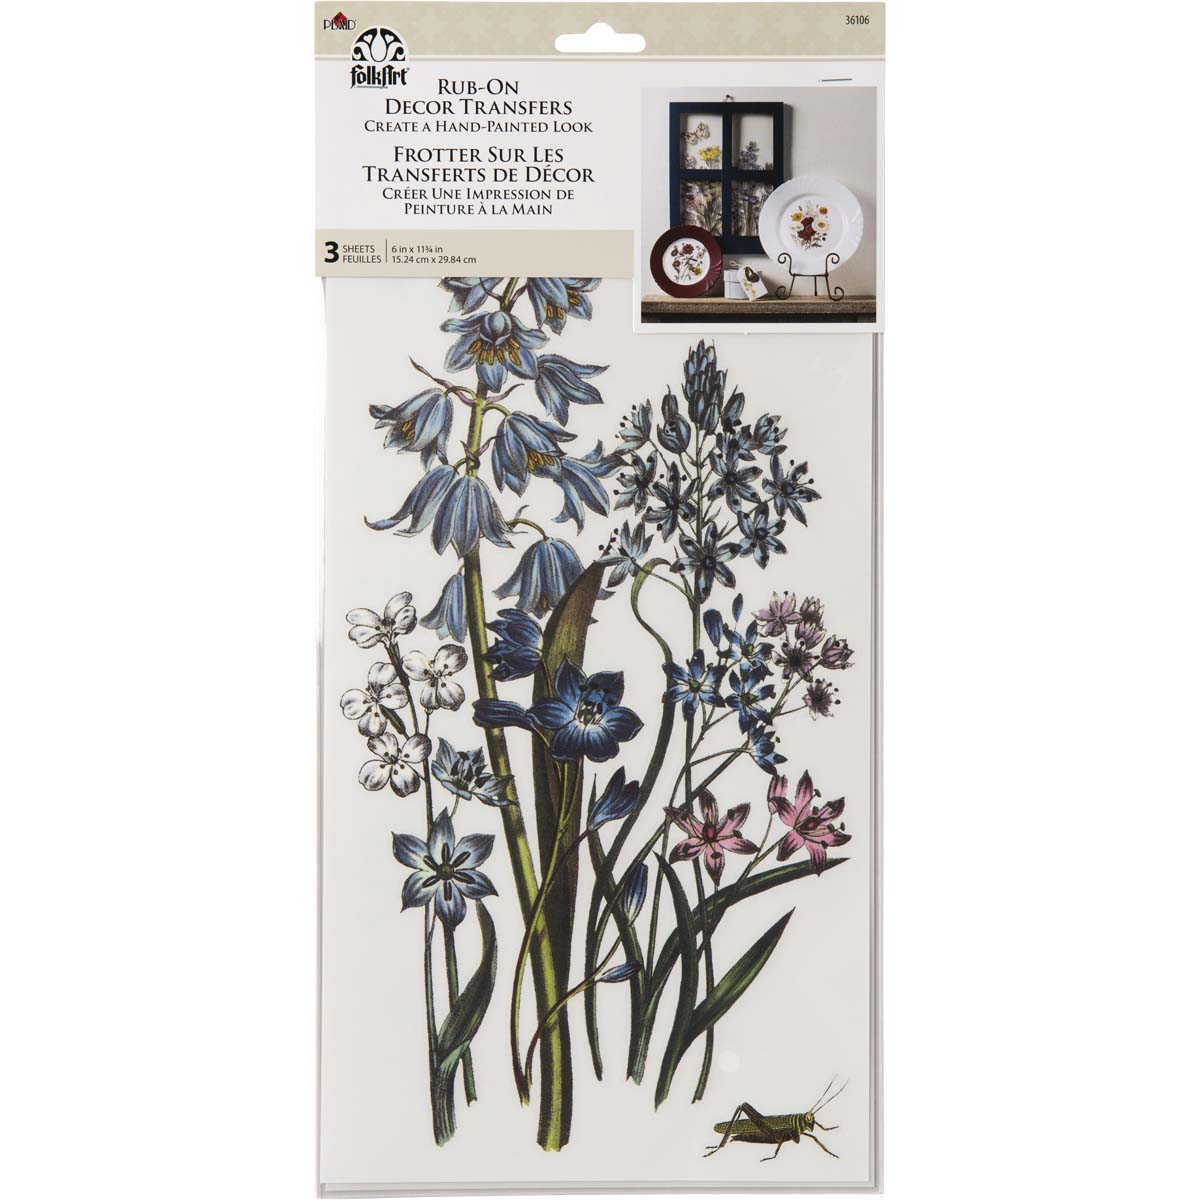 FolkArt ® Rub-On Décor Transfer - Botanical, 3 pc. - 36106